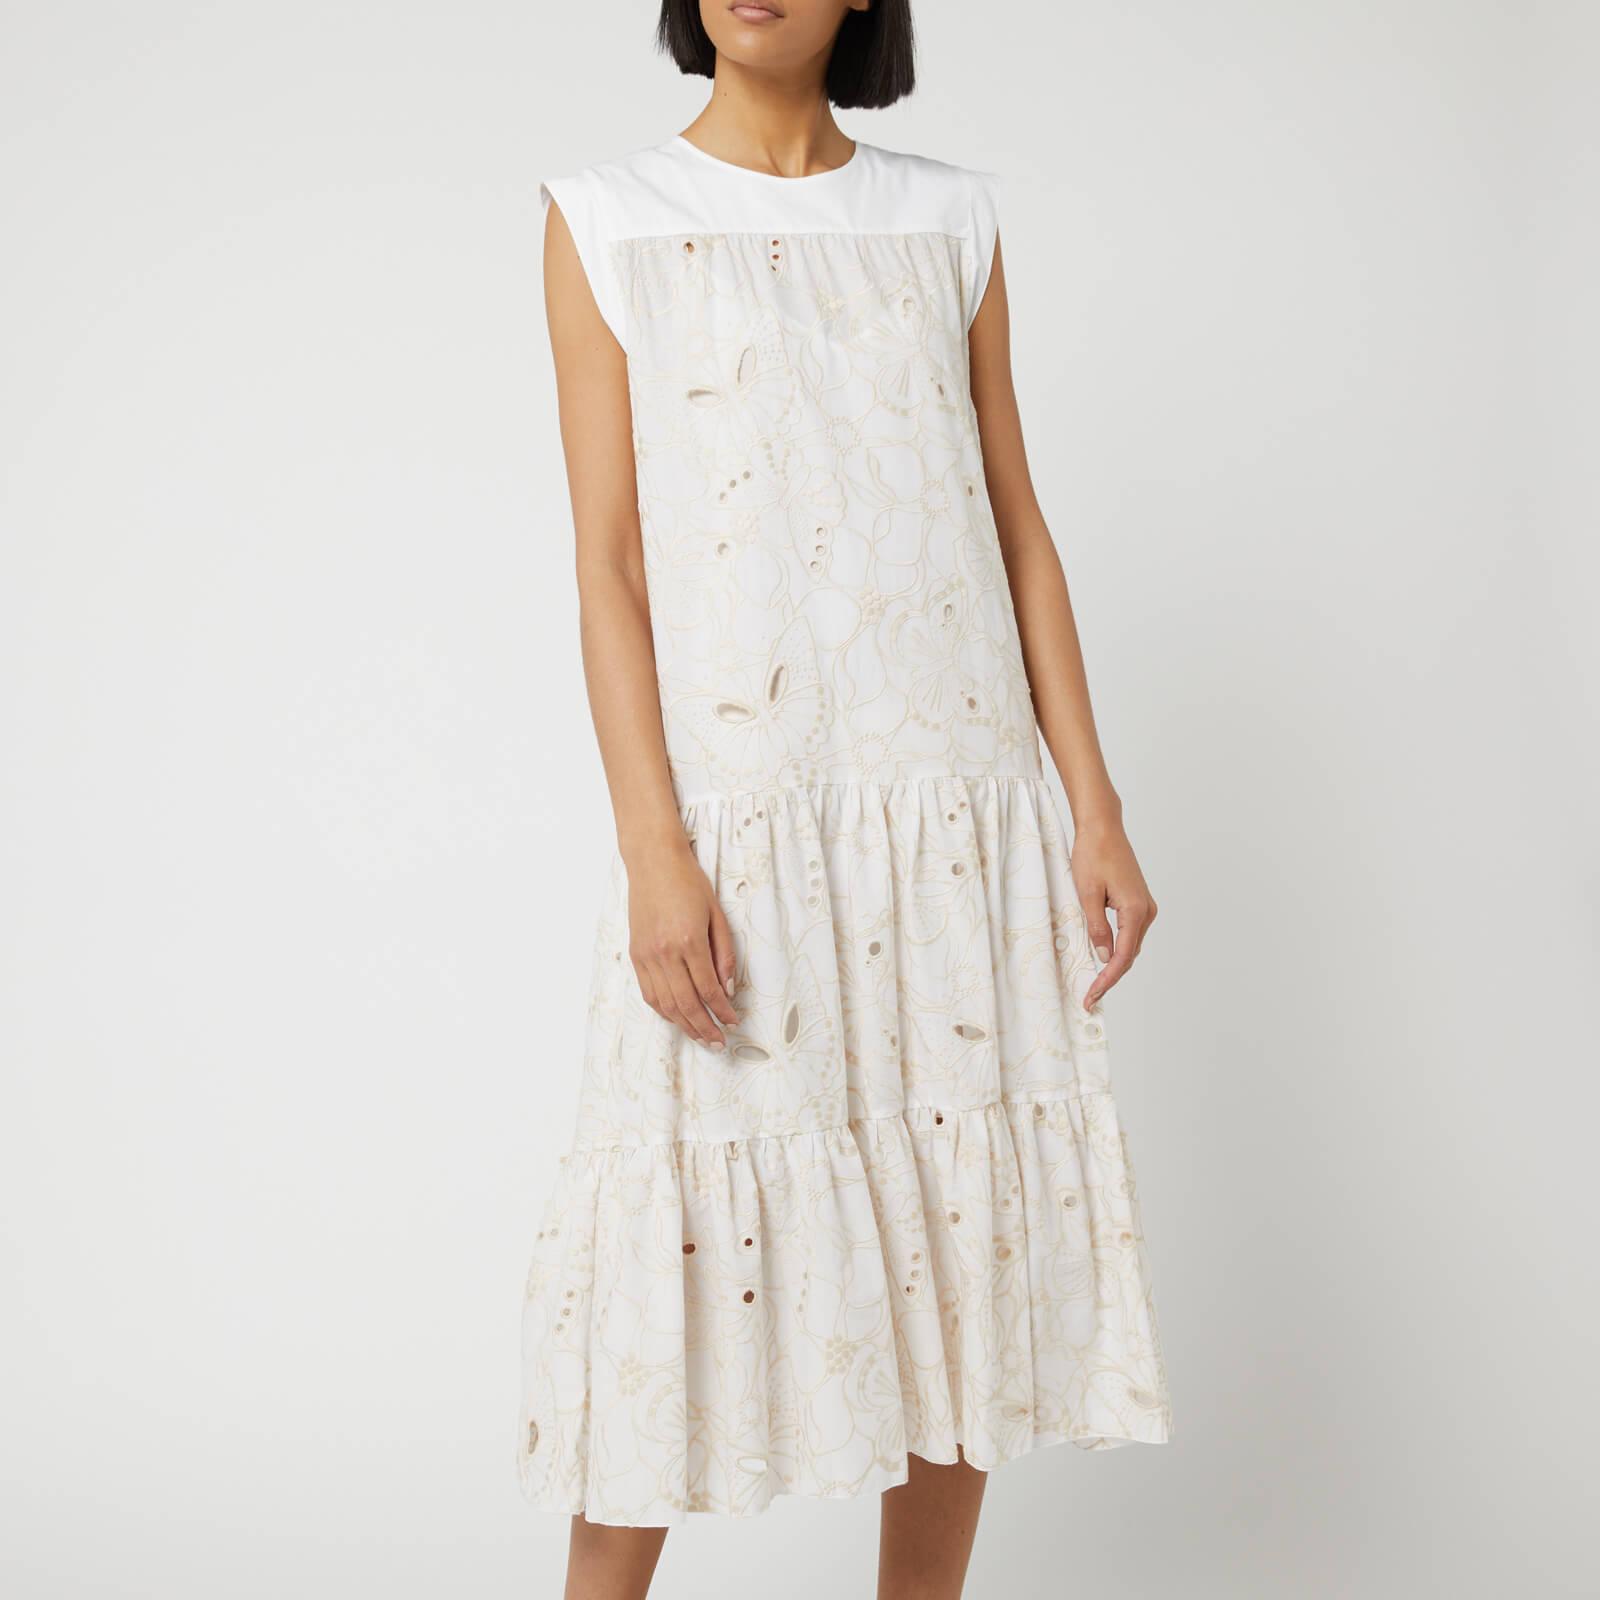 66d1a472a8 See By Chloé Women's Laser Cut Midi Dress - White Beige